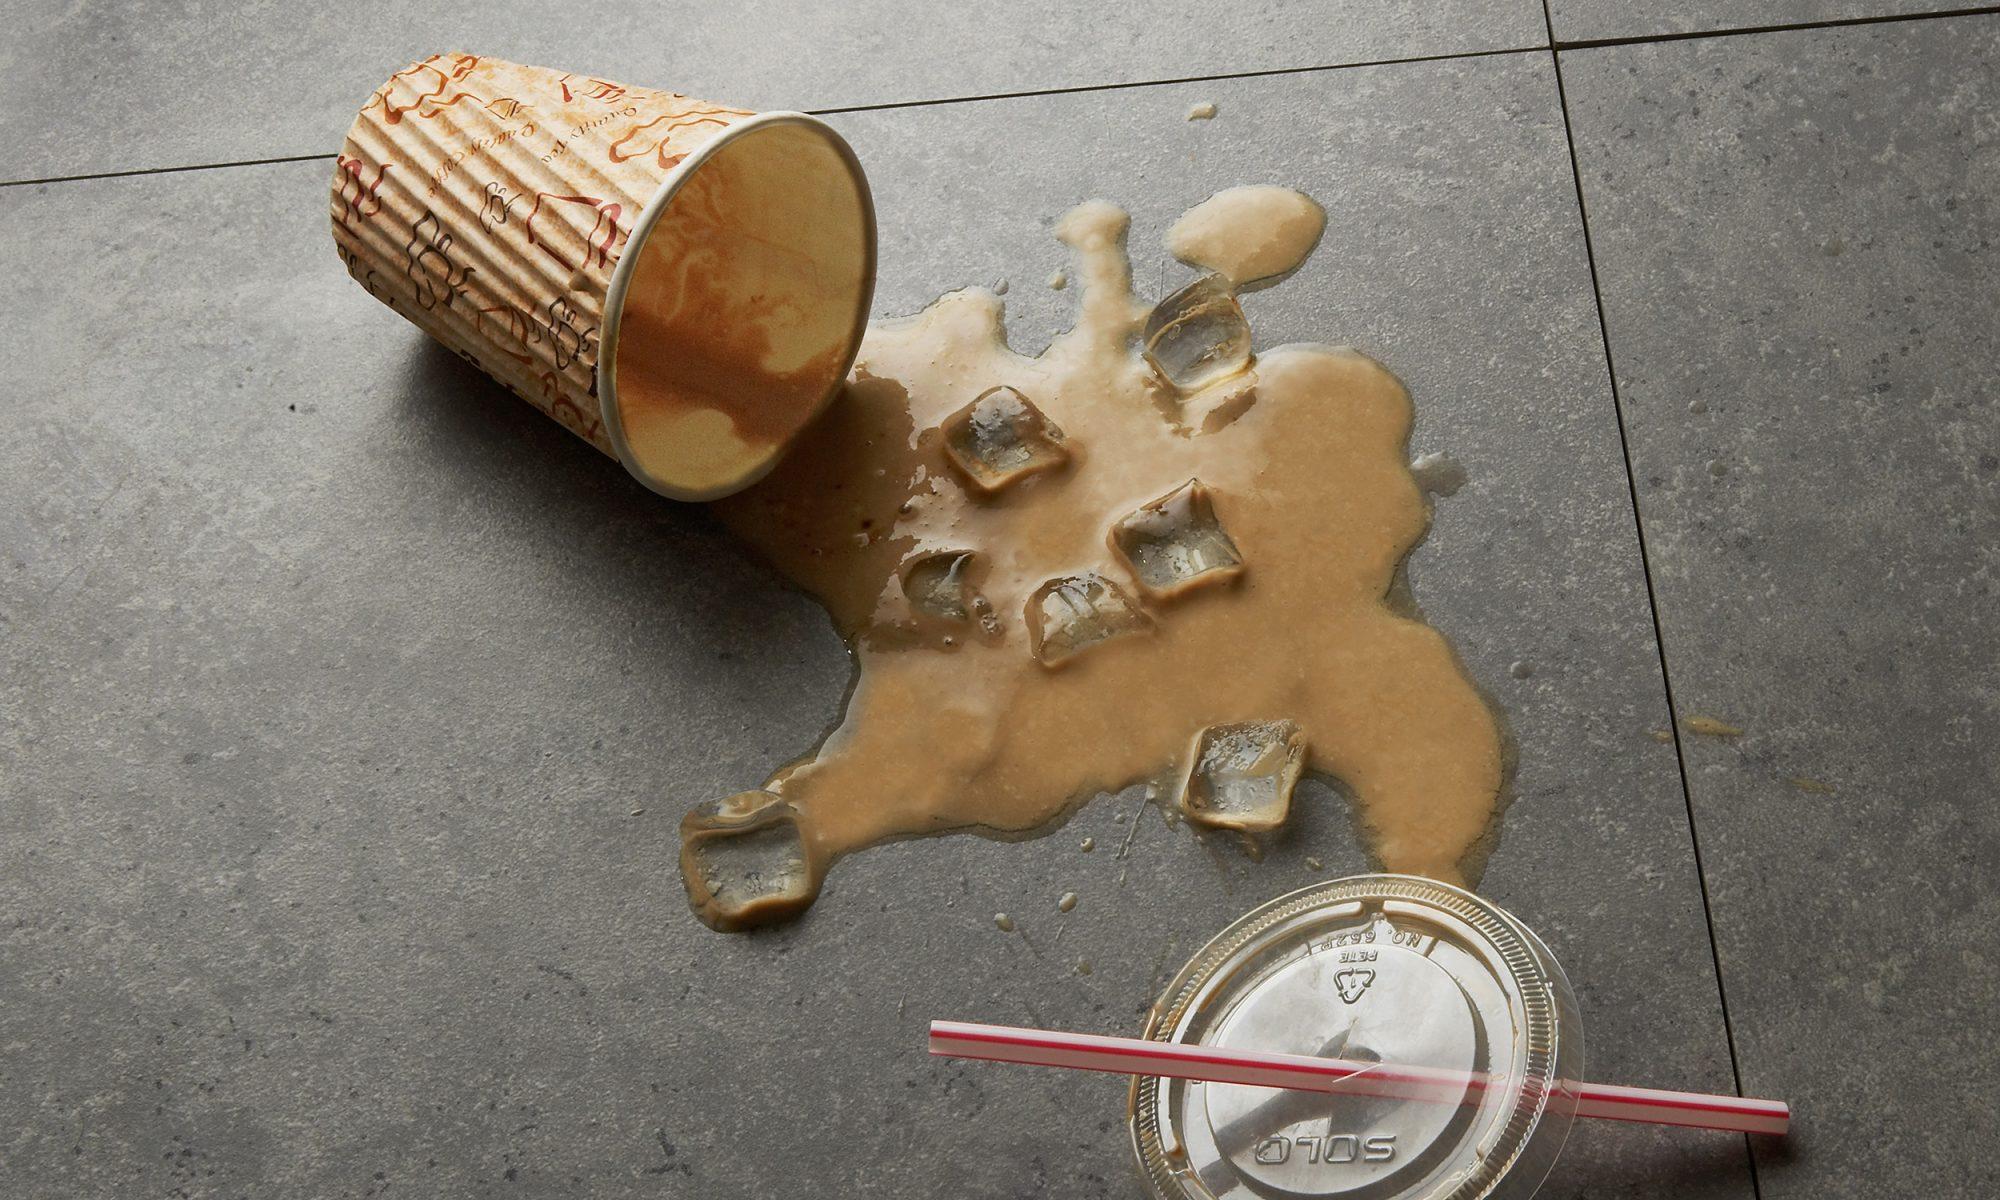 EC: I Hate Iced Coffee